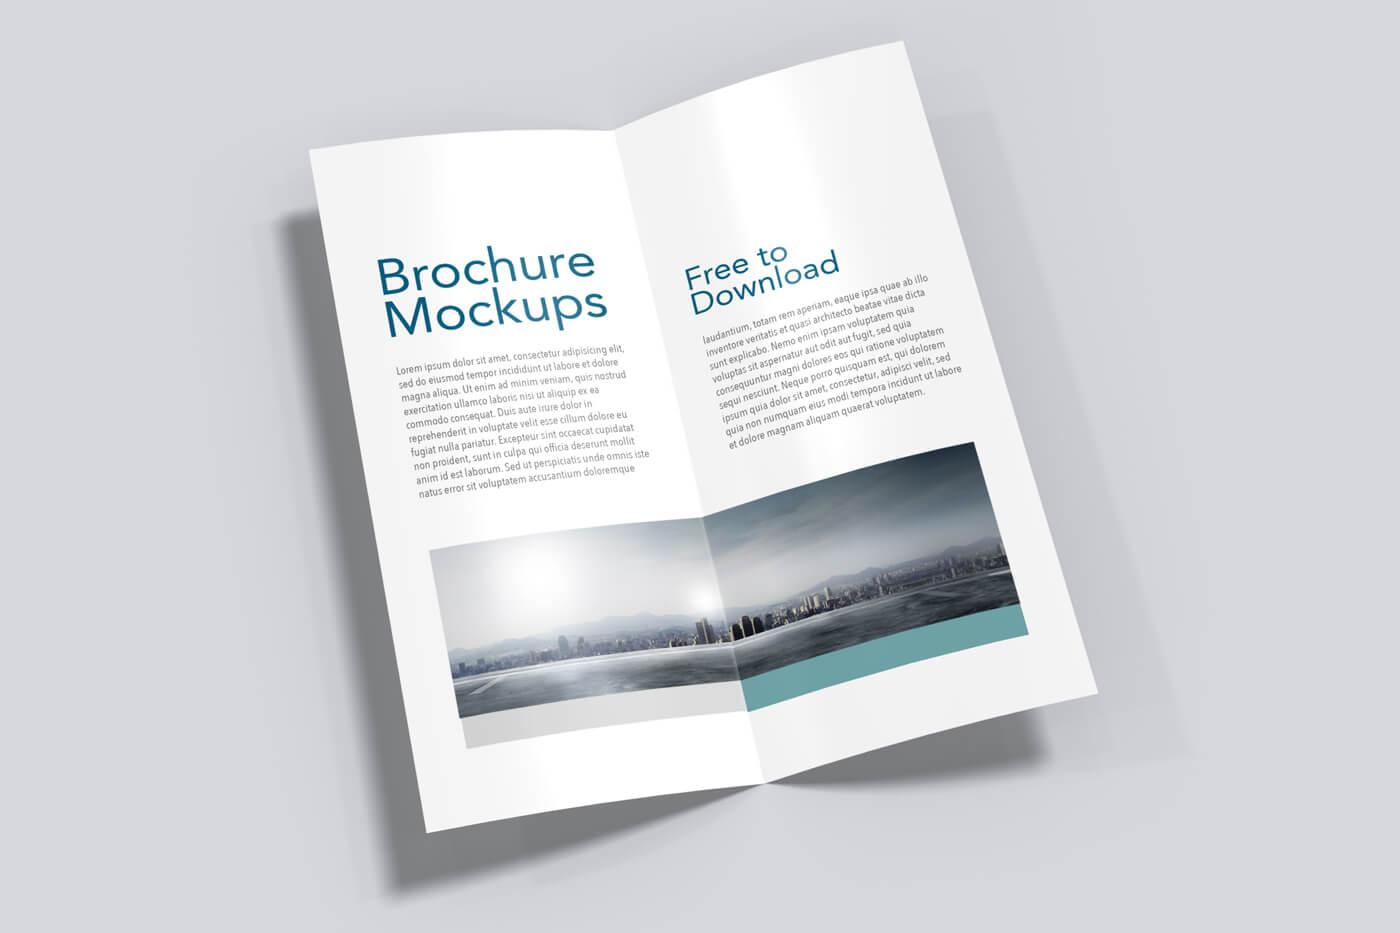 8.5x5.5 Half Fold Vertical Brochure Mockup 03